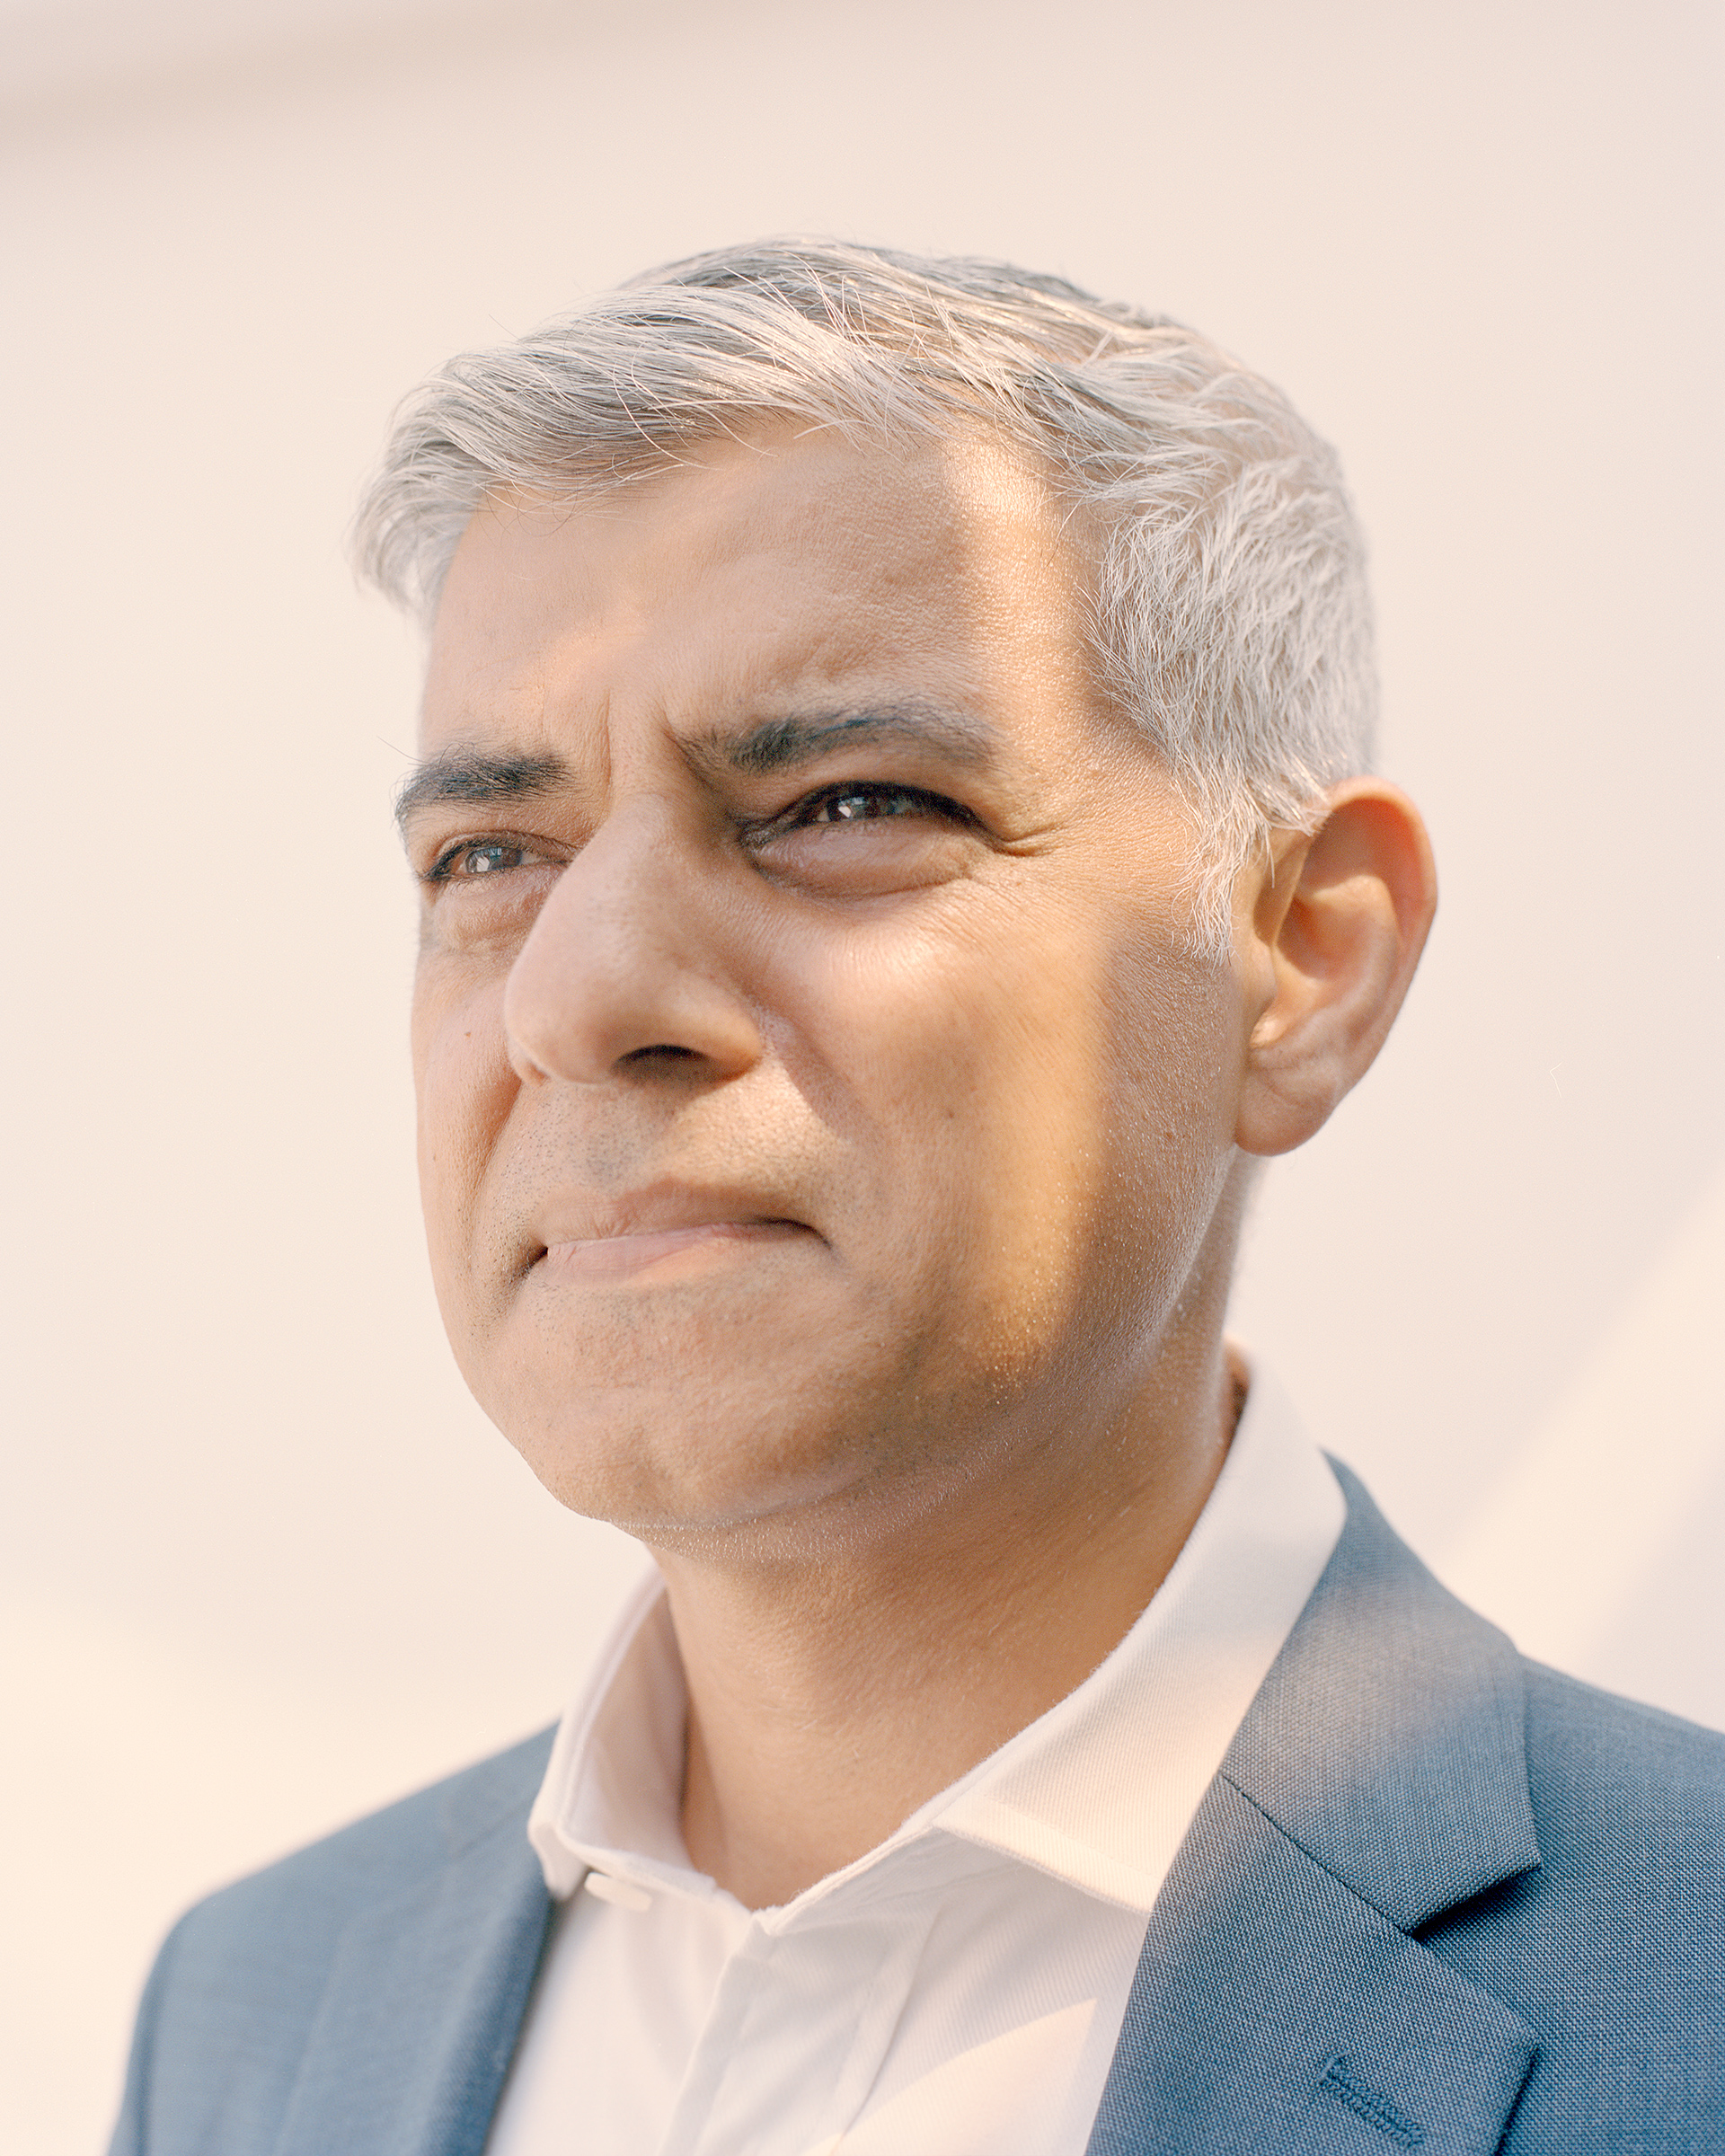 London Mayor Sadiq Khan, photographed at London's City Hall on July 21, 2021.